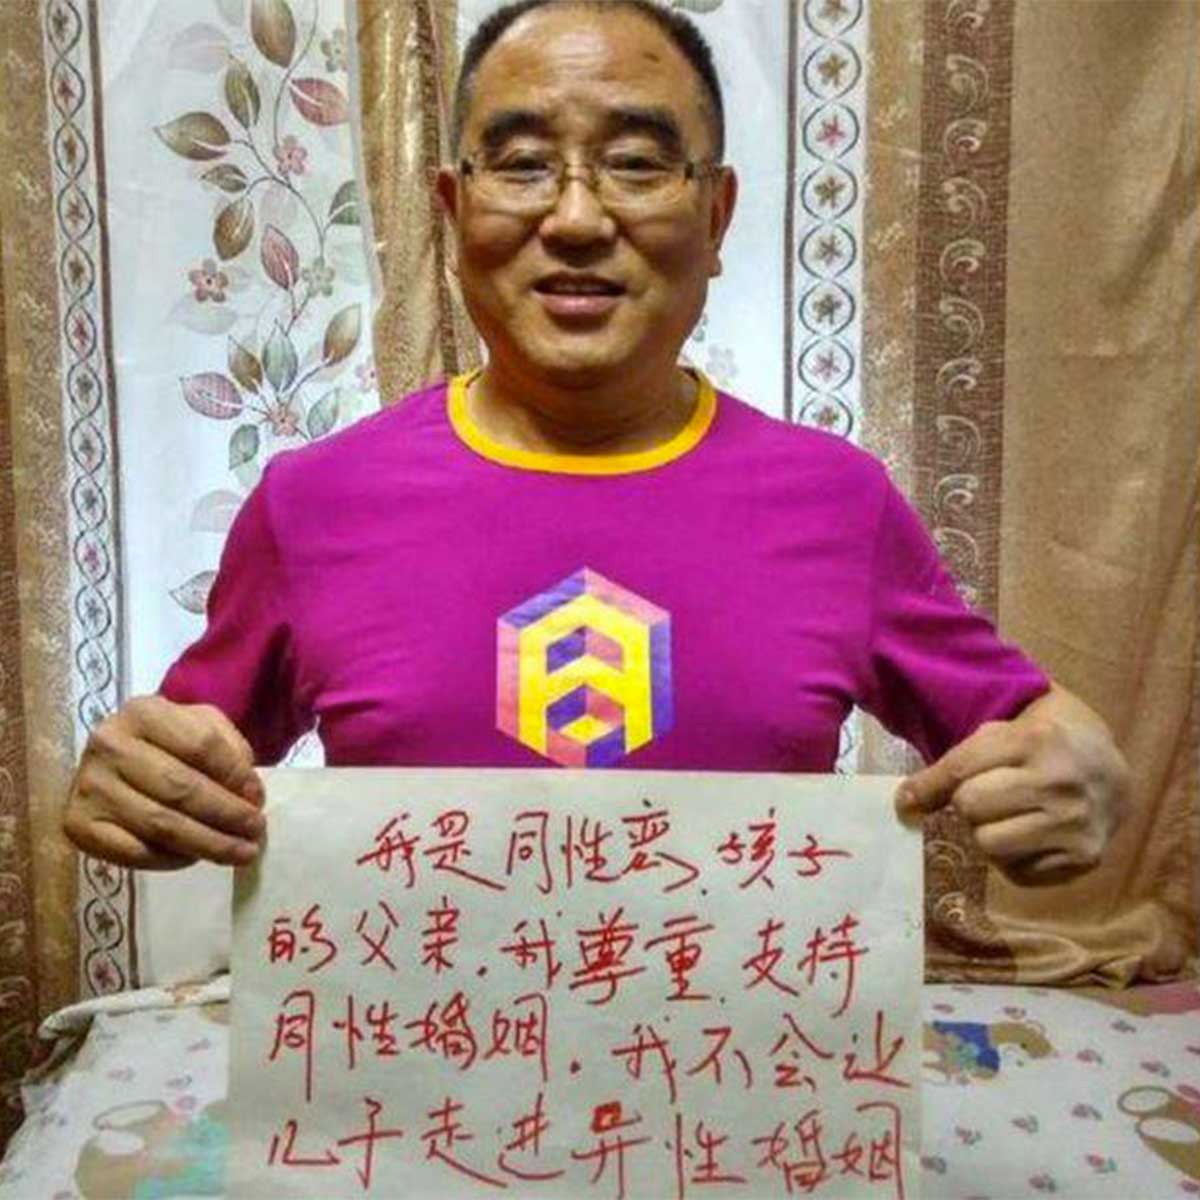 Chine mariages de convenance xinghun campagne